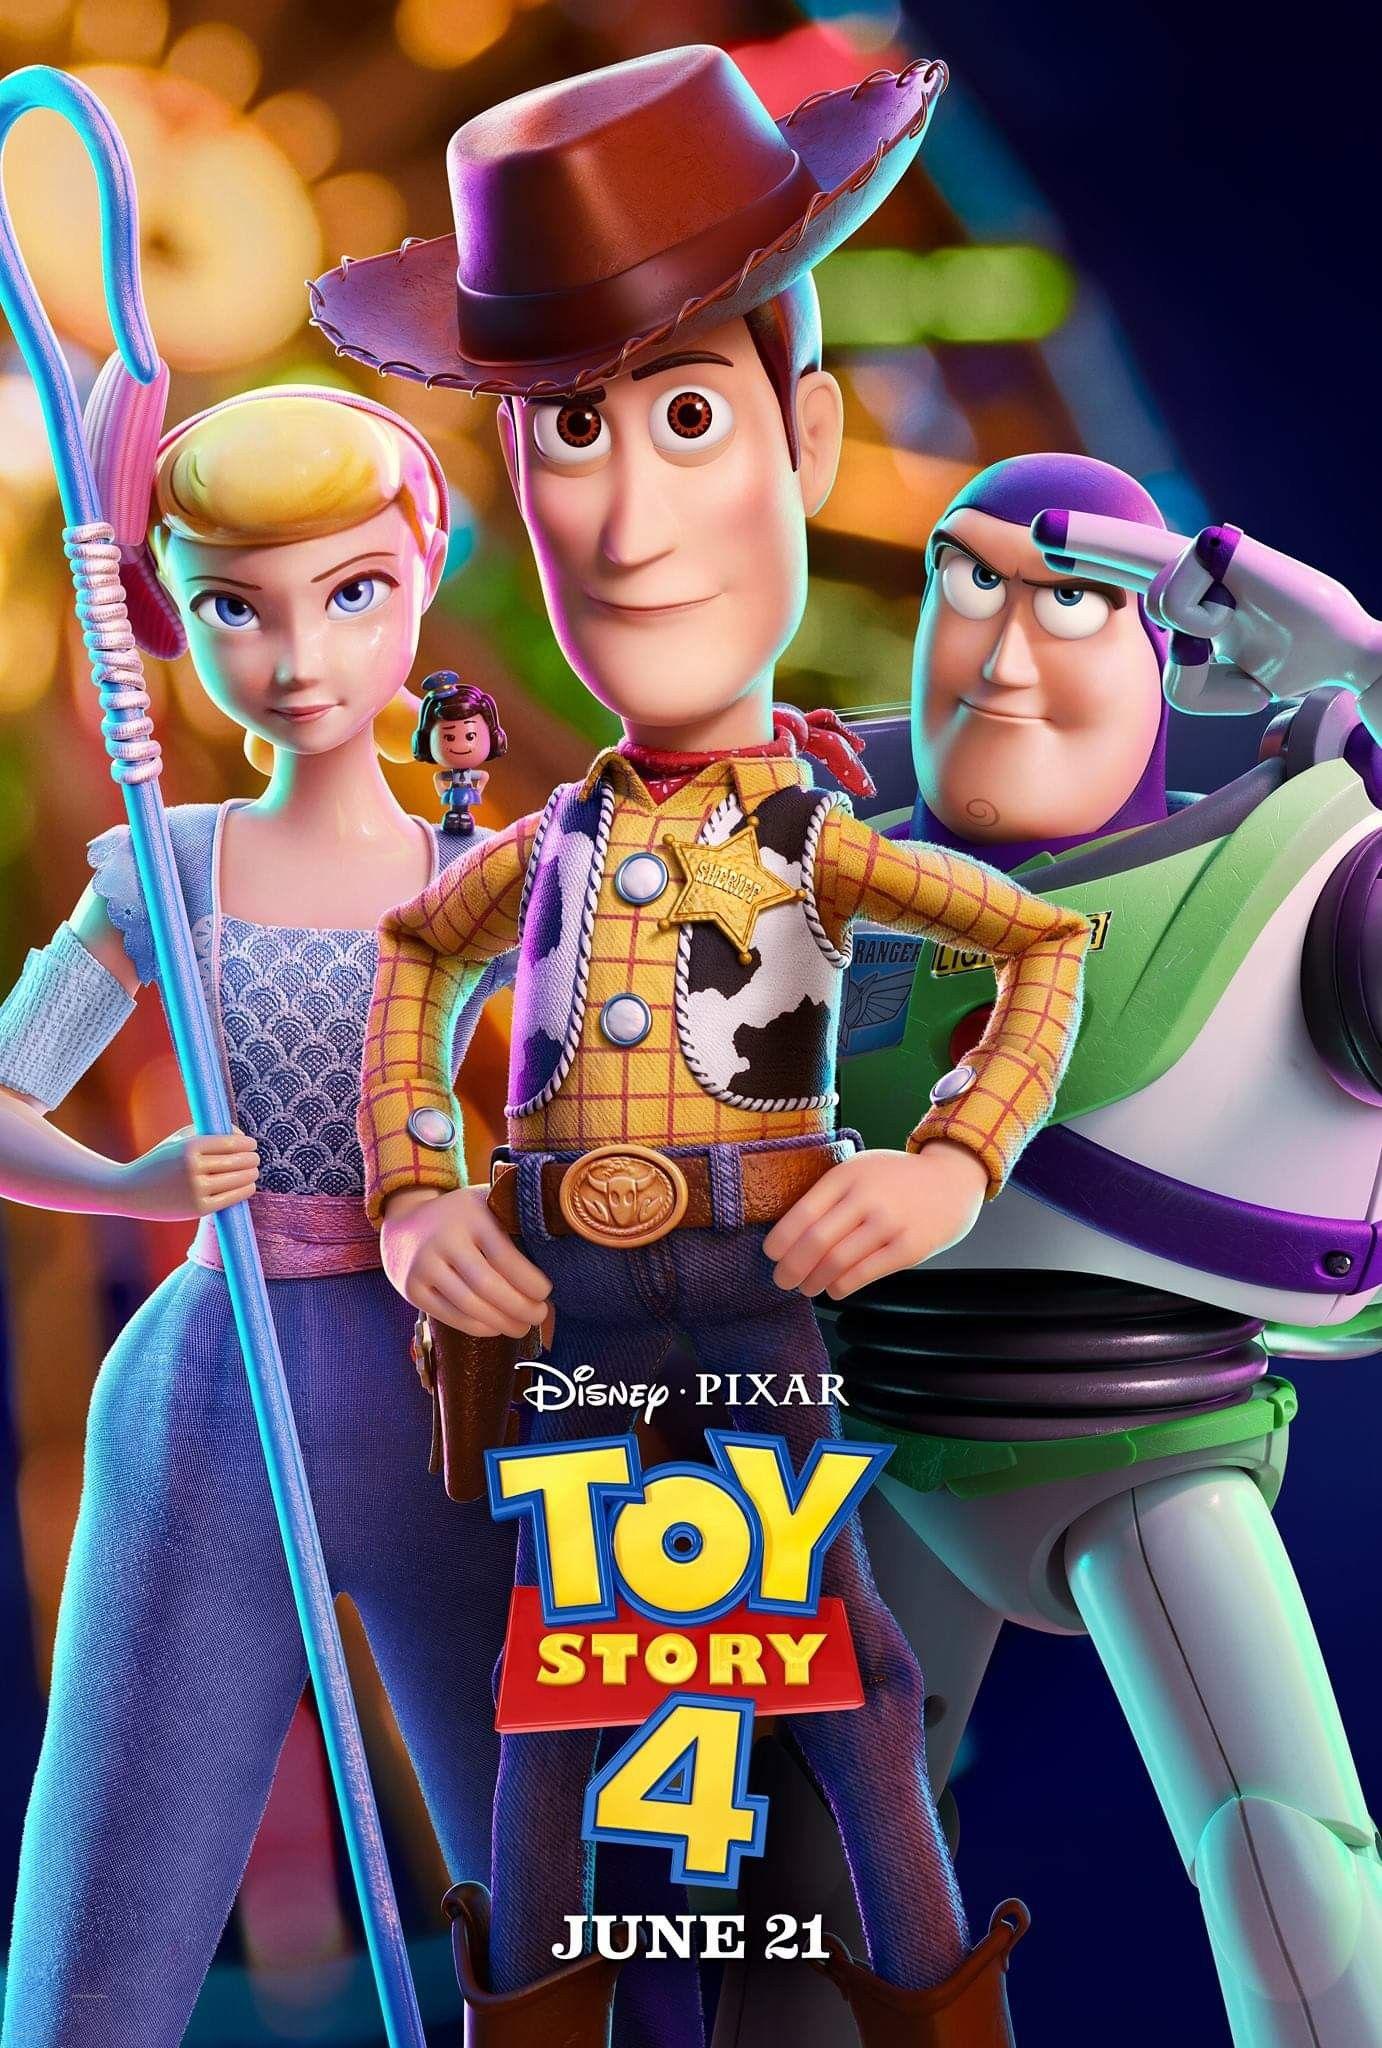 Toy Story 4 2019 Peliculas Animadas Disney Peliculas De Disney Pixar Peliculas De Disney